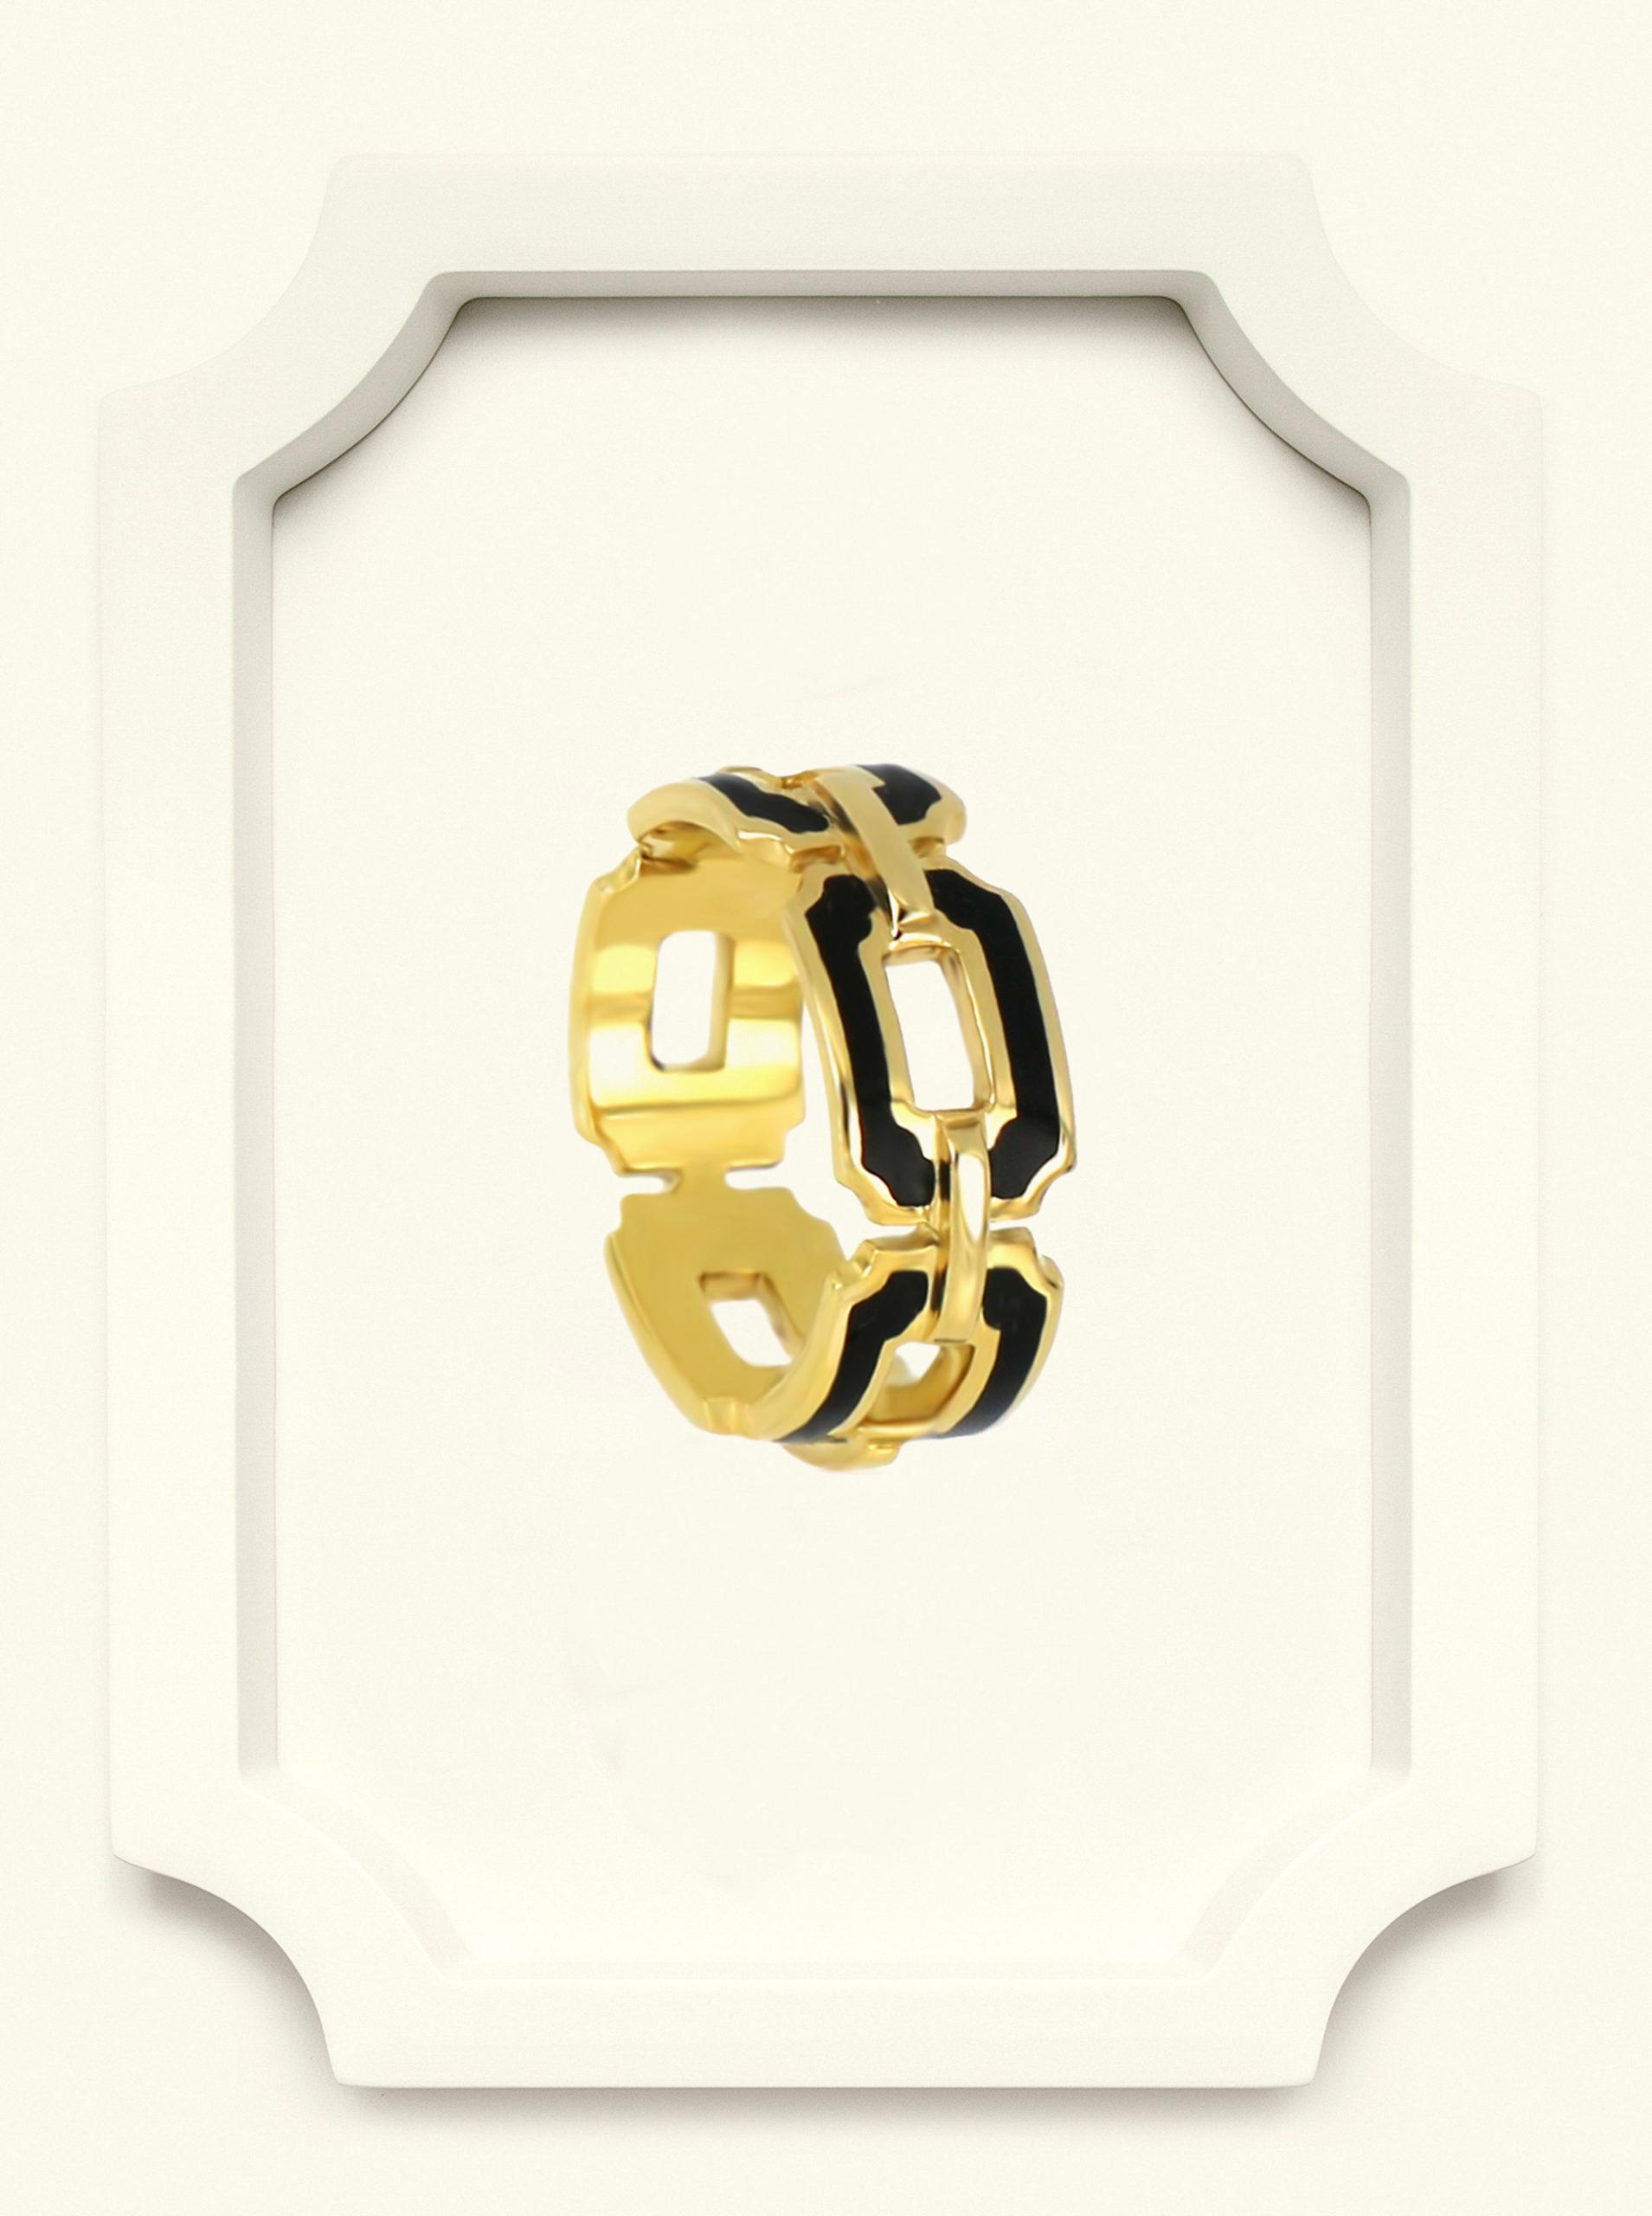 Saba Yellow Gold Signature Ring with Black Enamel